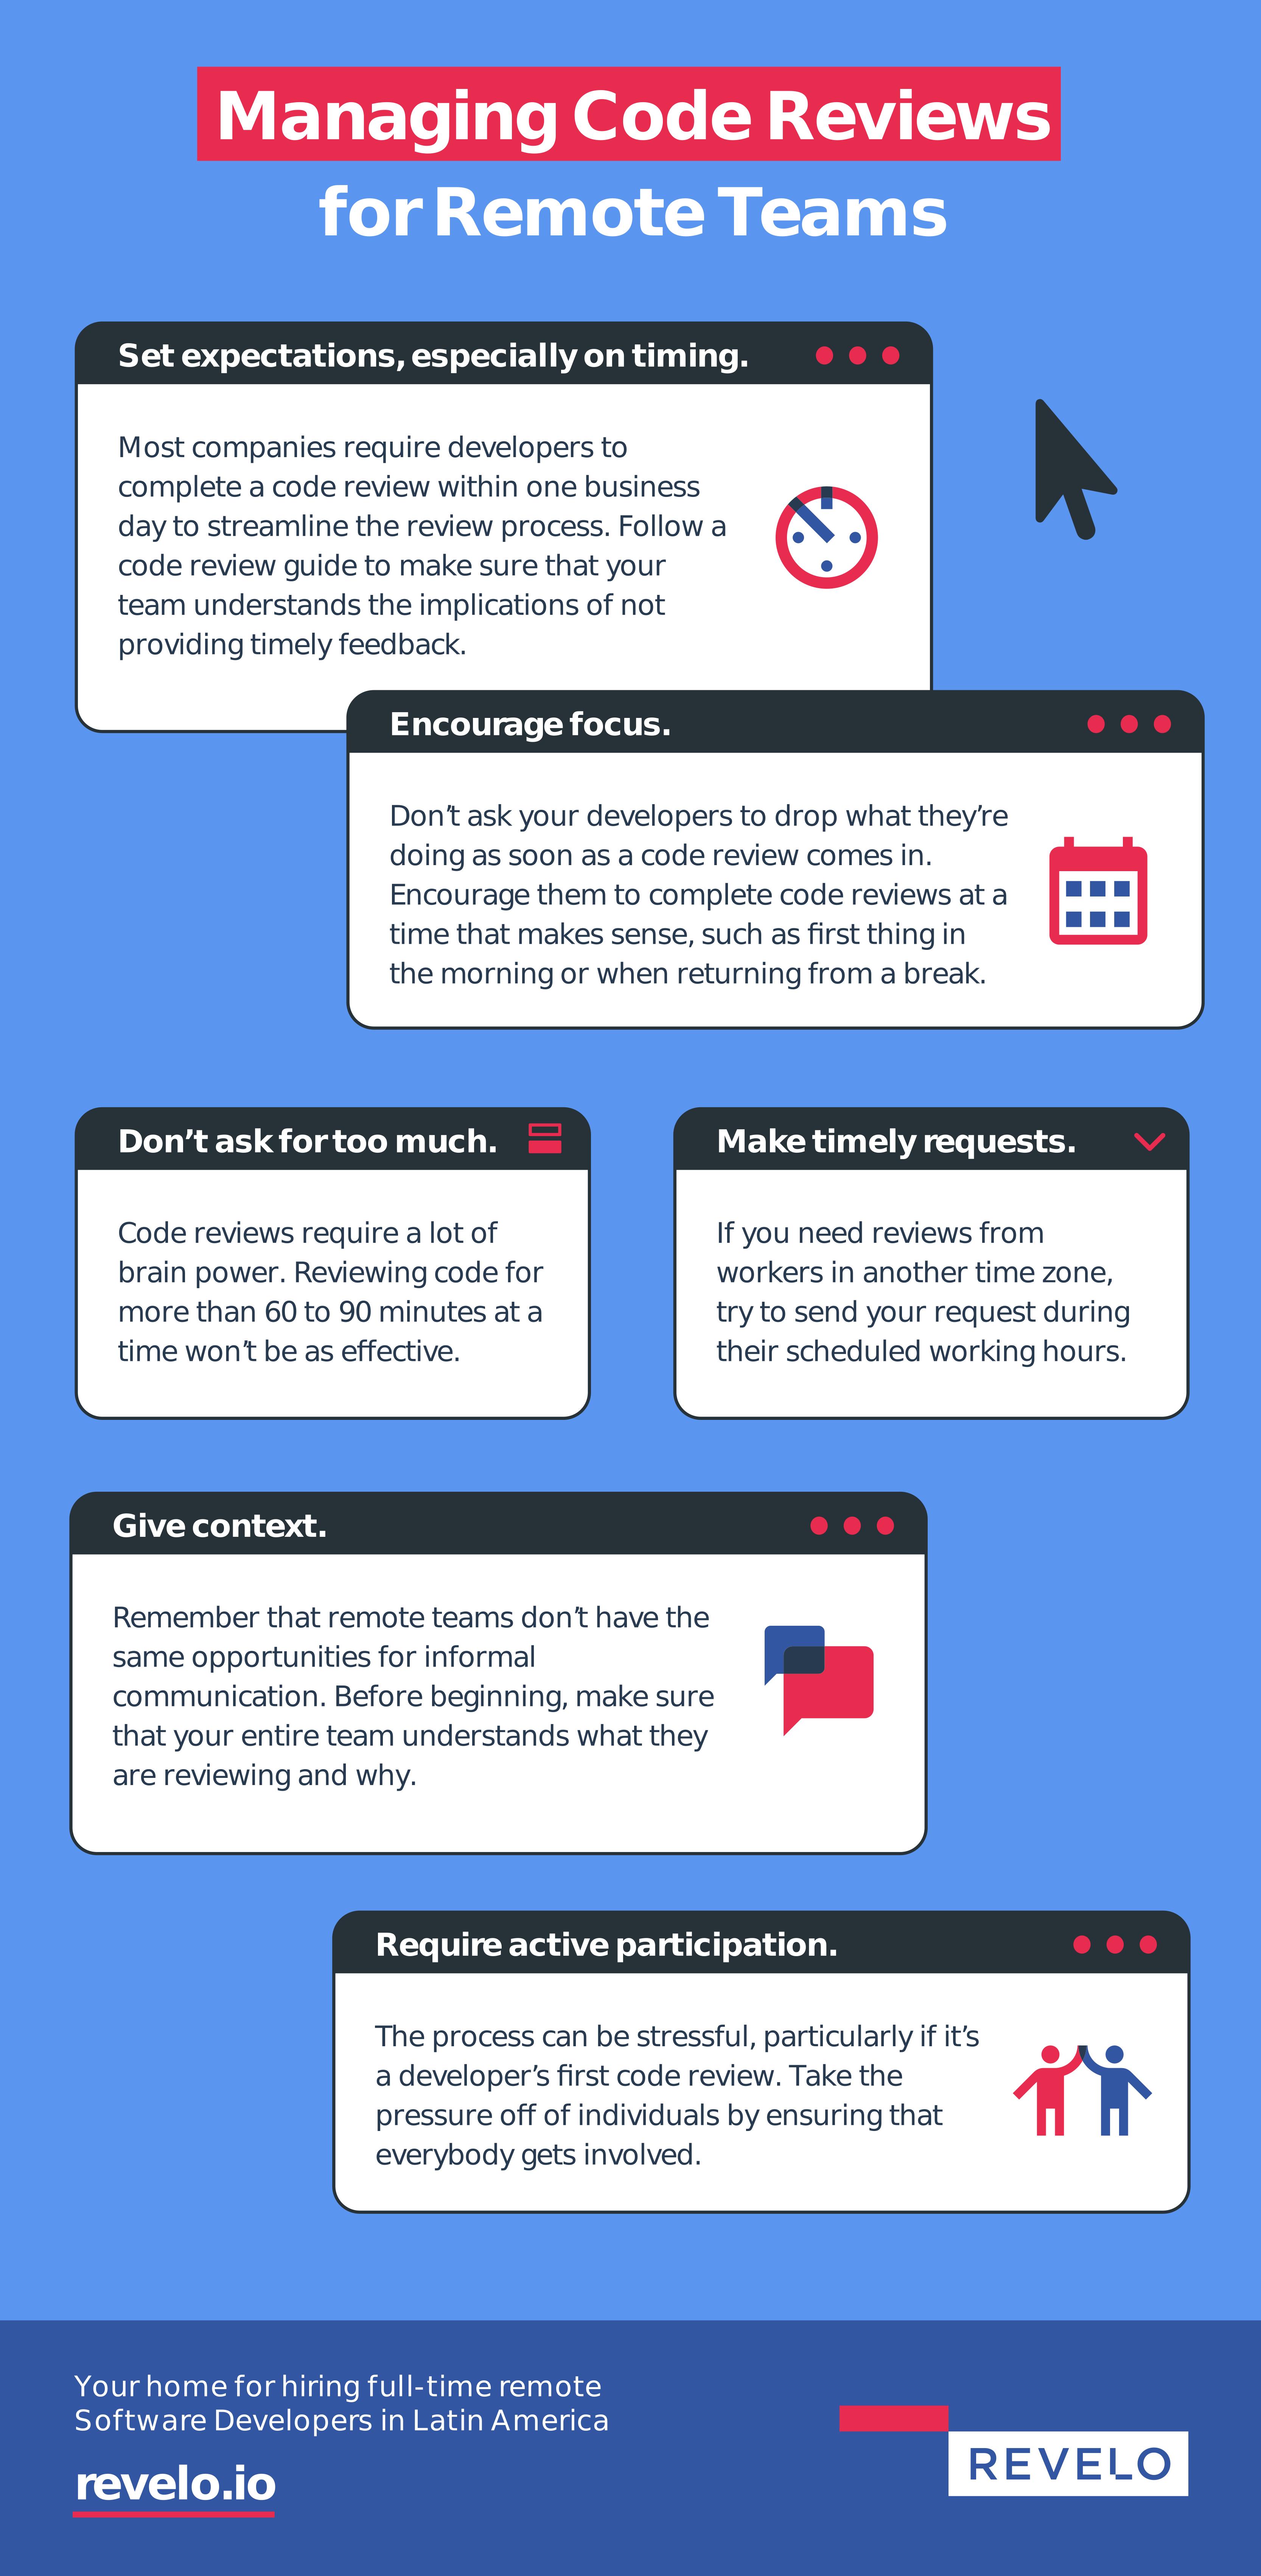 Managing Code Reviews for Remote Teams